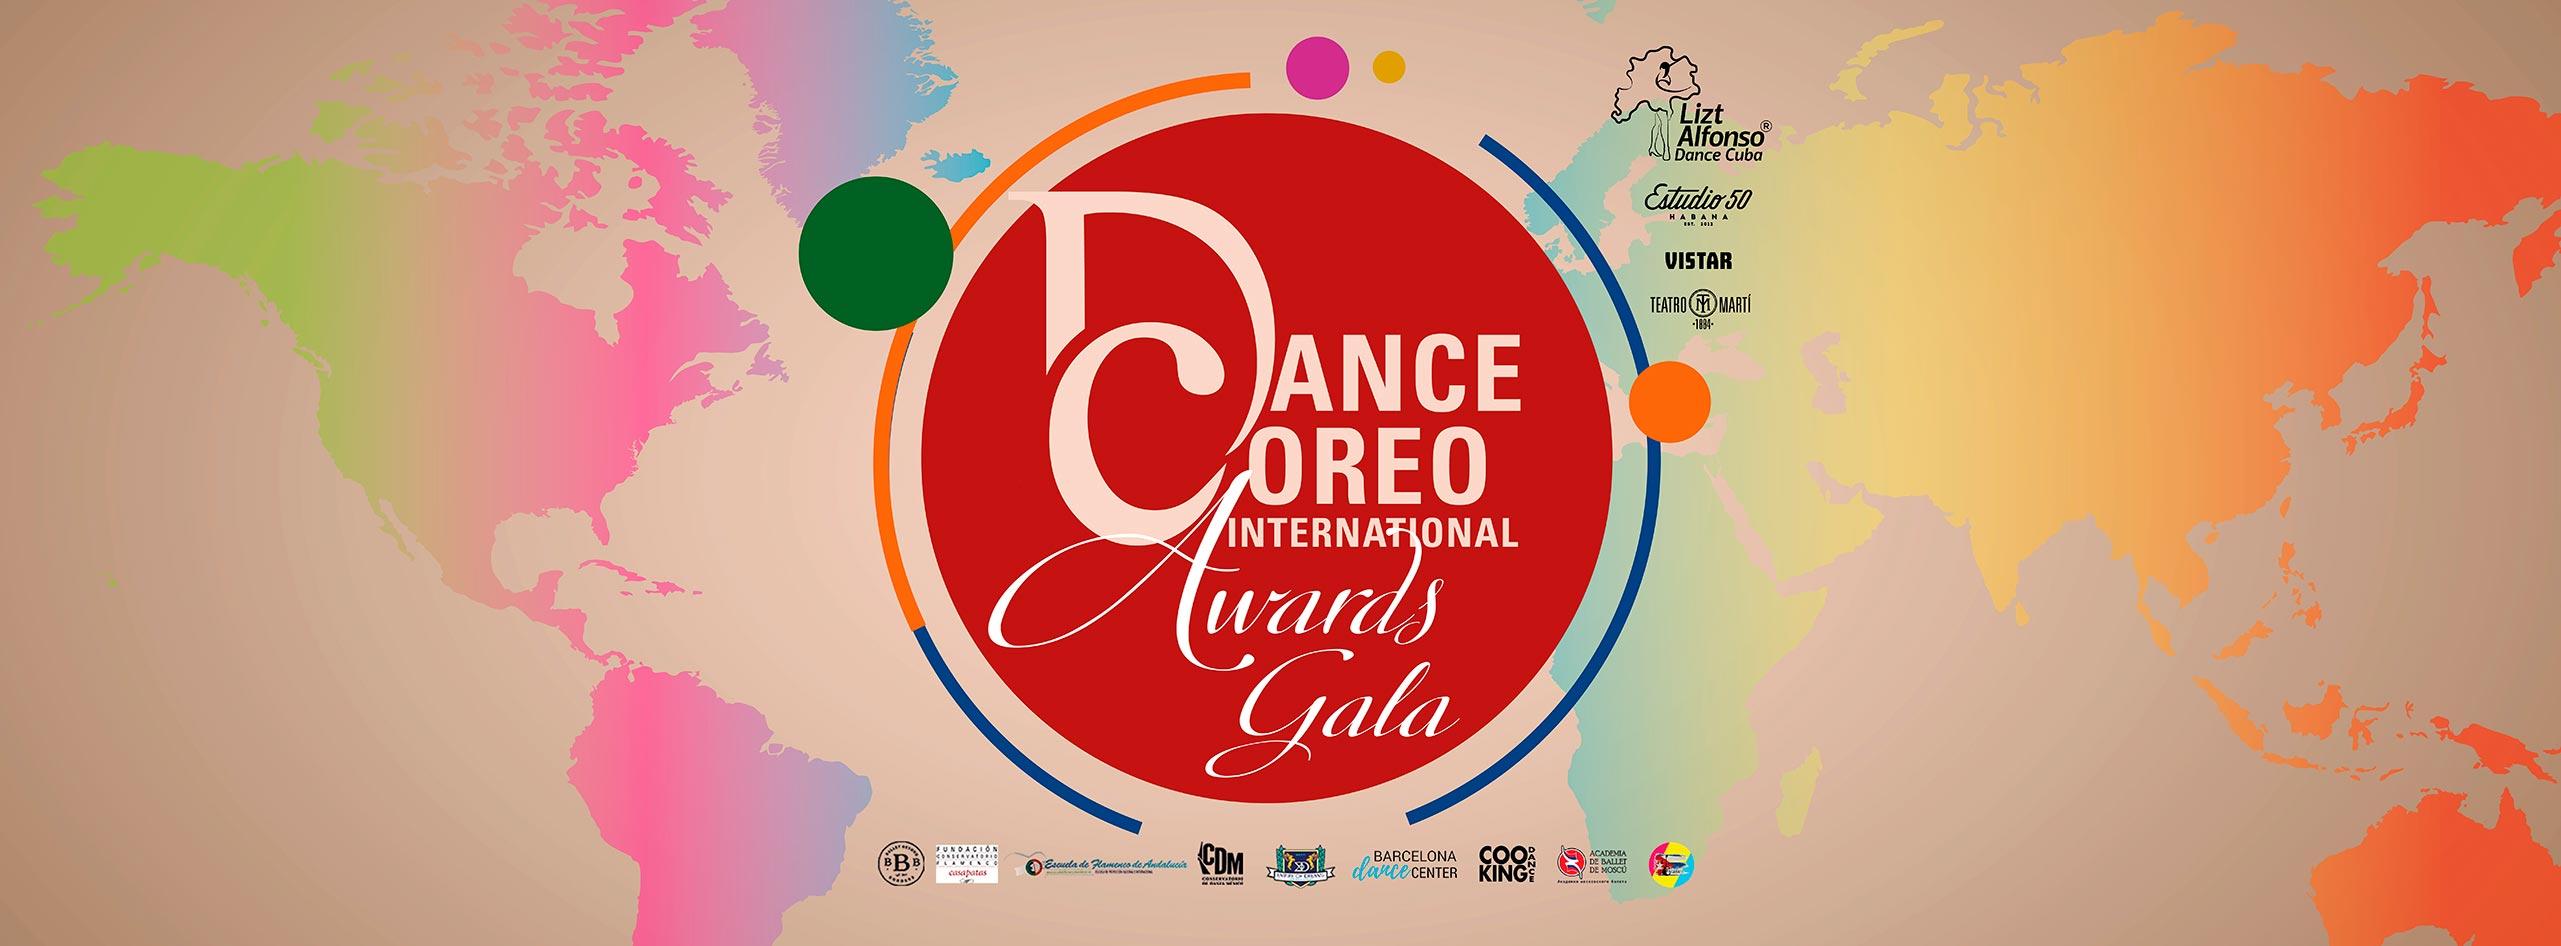 DANCECOREO International AWARDS GALA